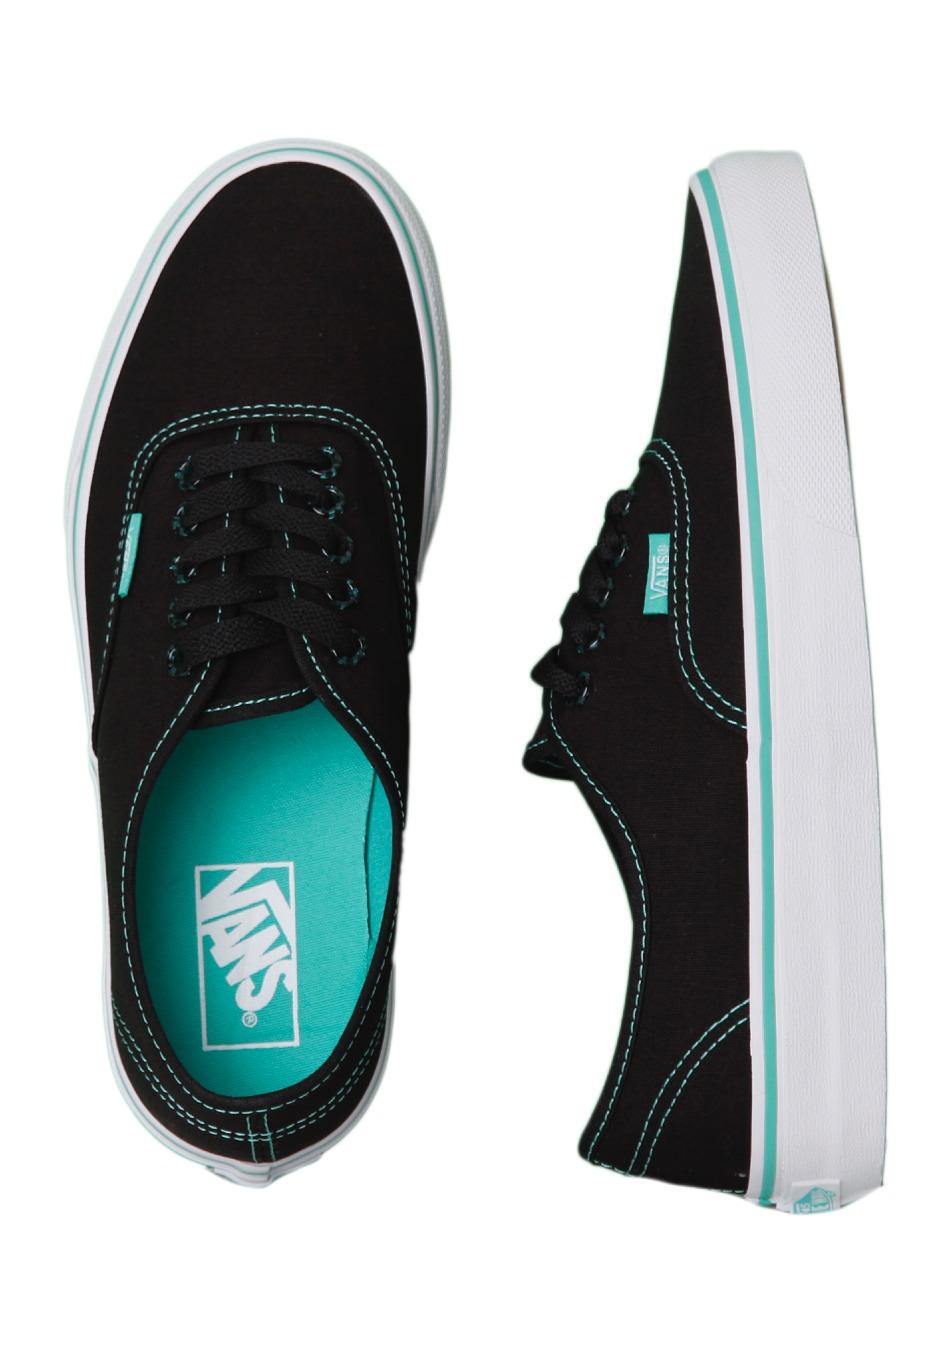 17bcece1119381 Vans - Authentic Tortoise Pop Black Pool Green - Girl Shoes - Impericon.com  UK